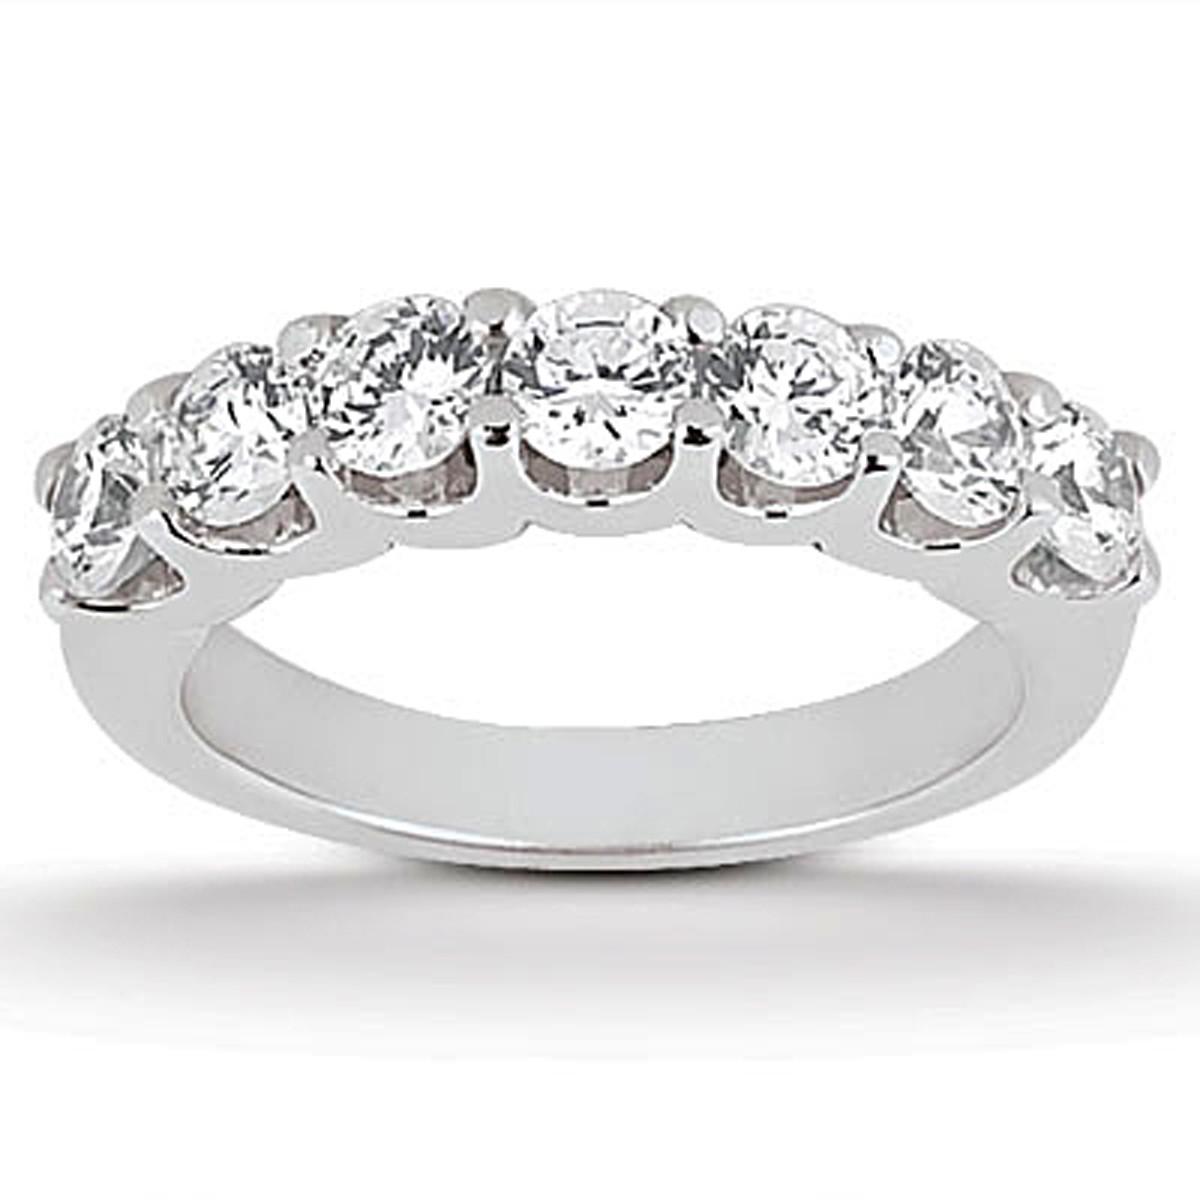 Diamond shared u prong setting wedding ring band 14k white for Jewelry wedding rings